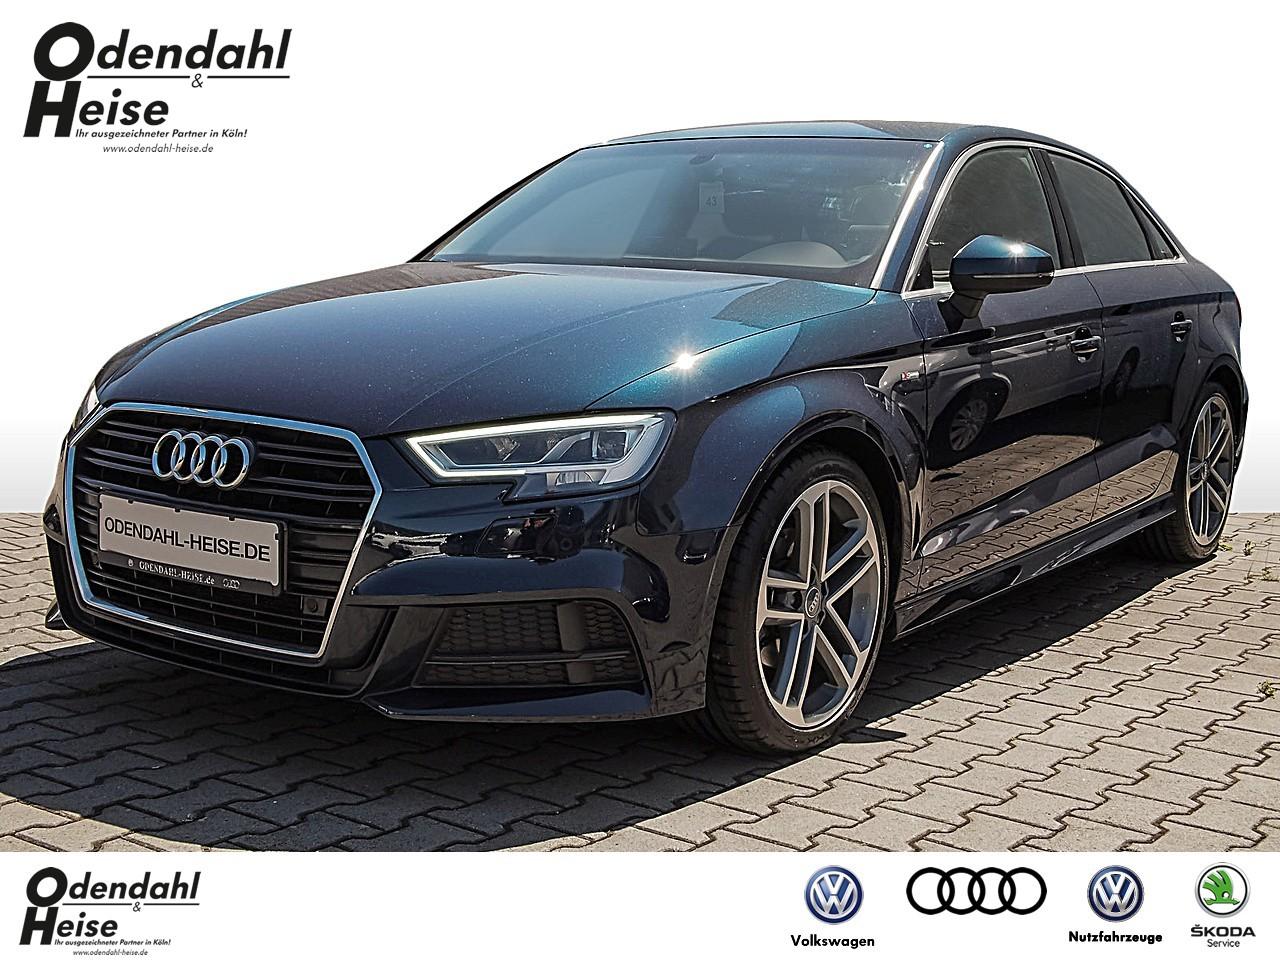 Audi A3 Limousine sport 2.0 TDI EU6 Klima Navi, Jahr 2017, Diesel